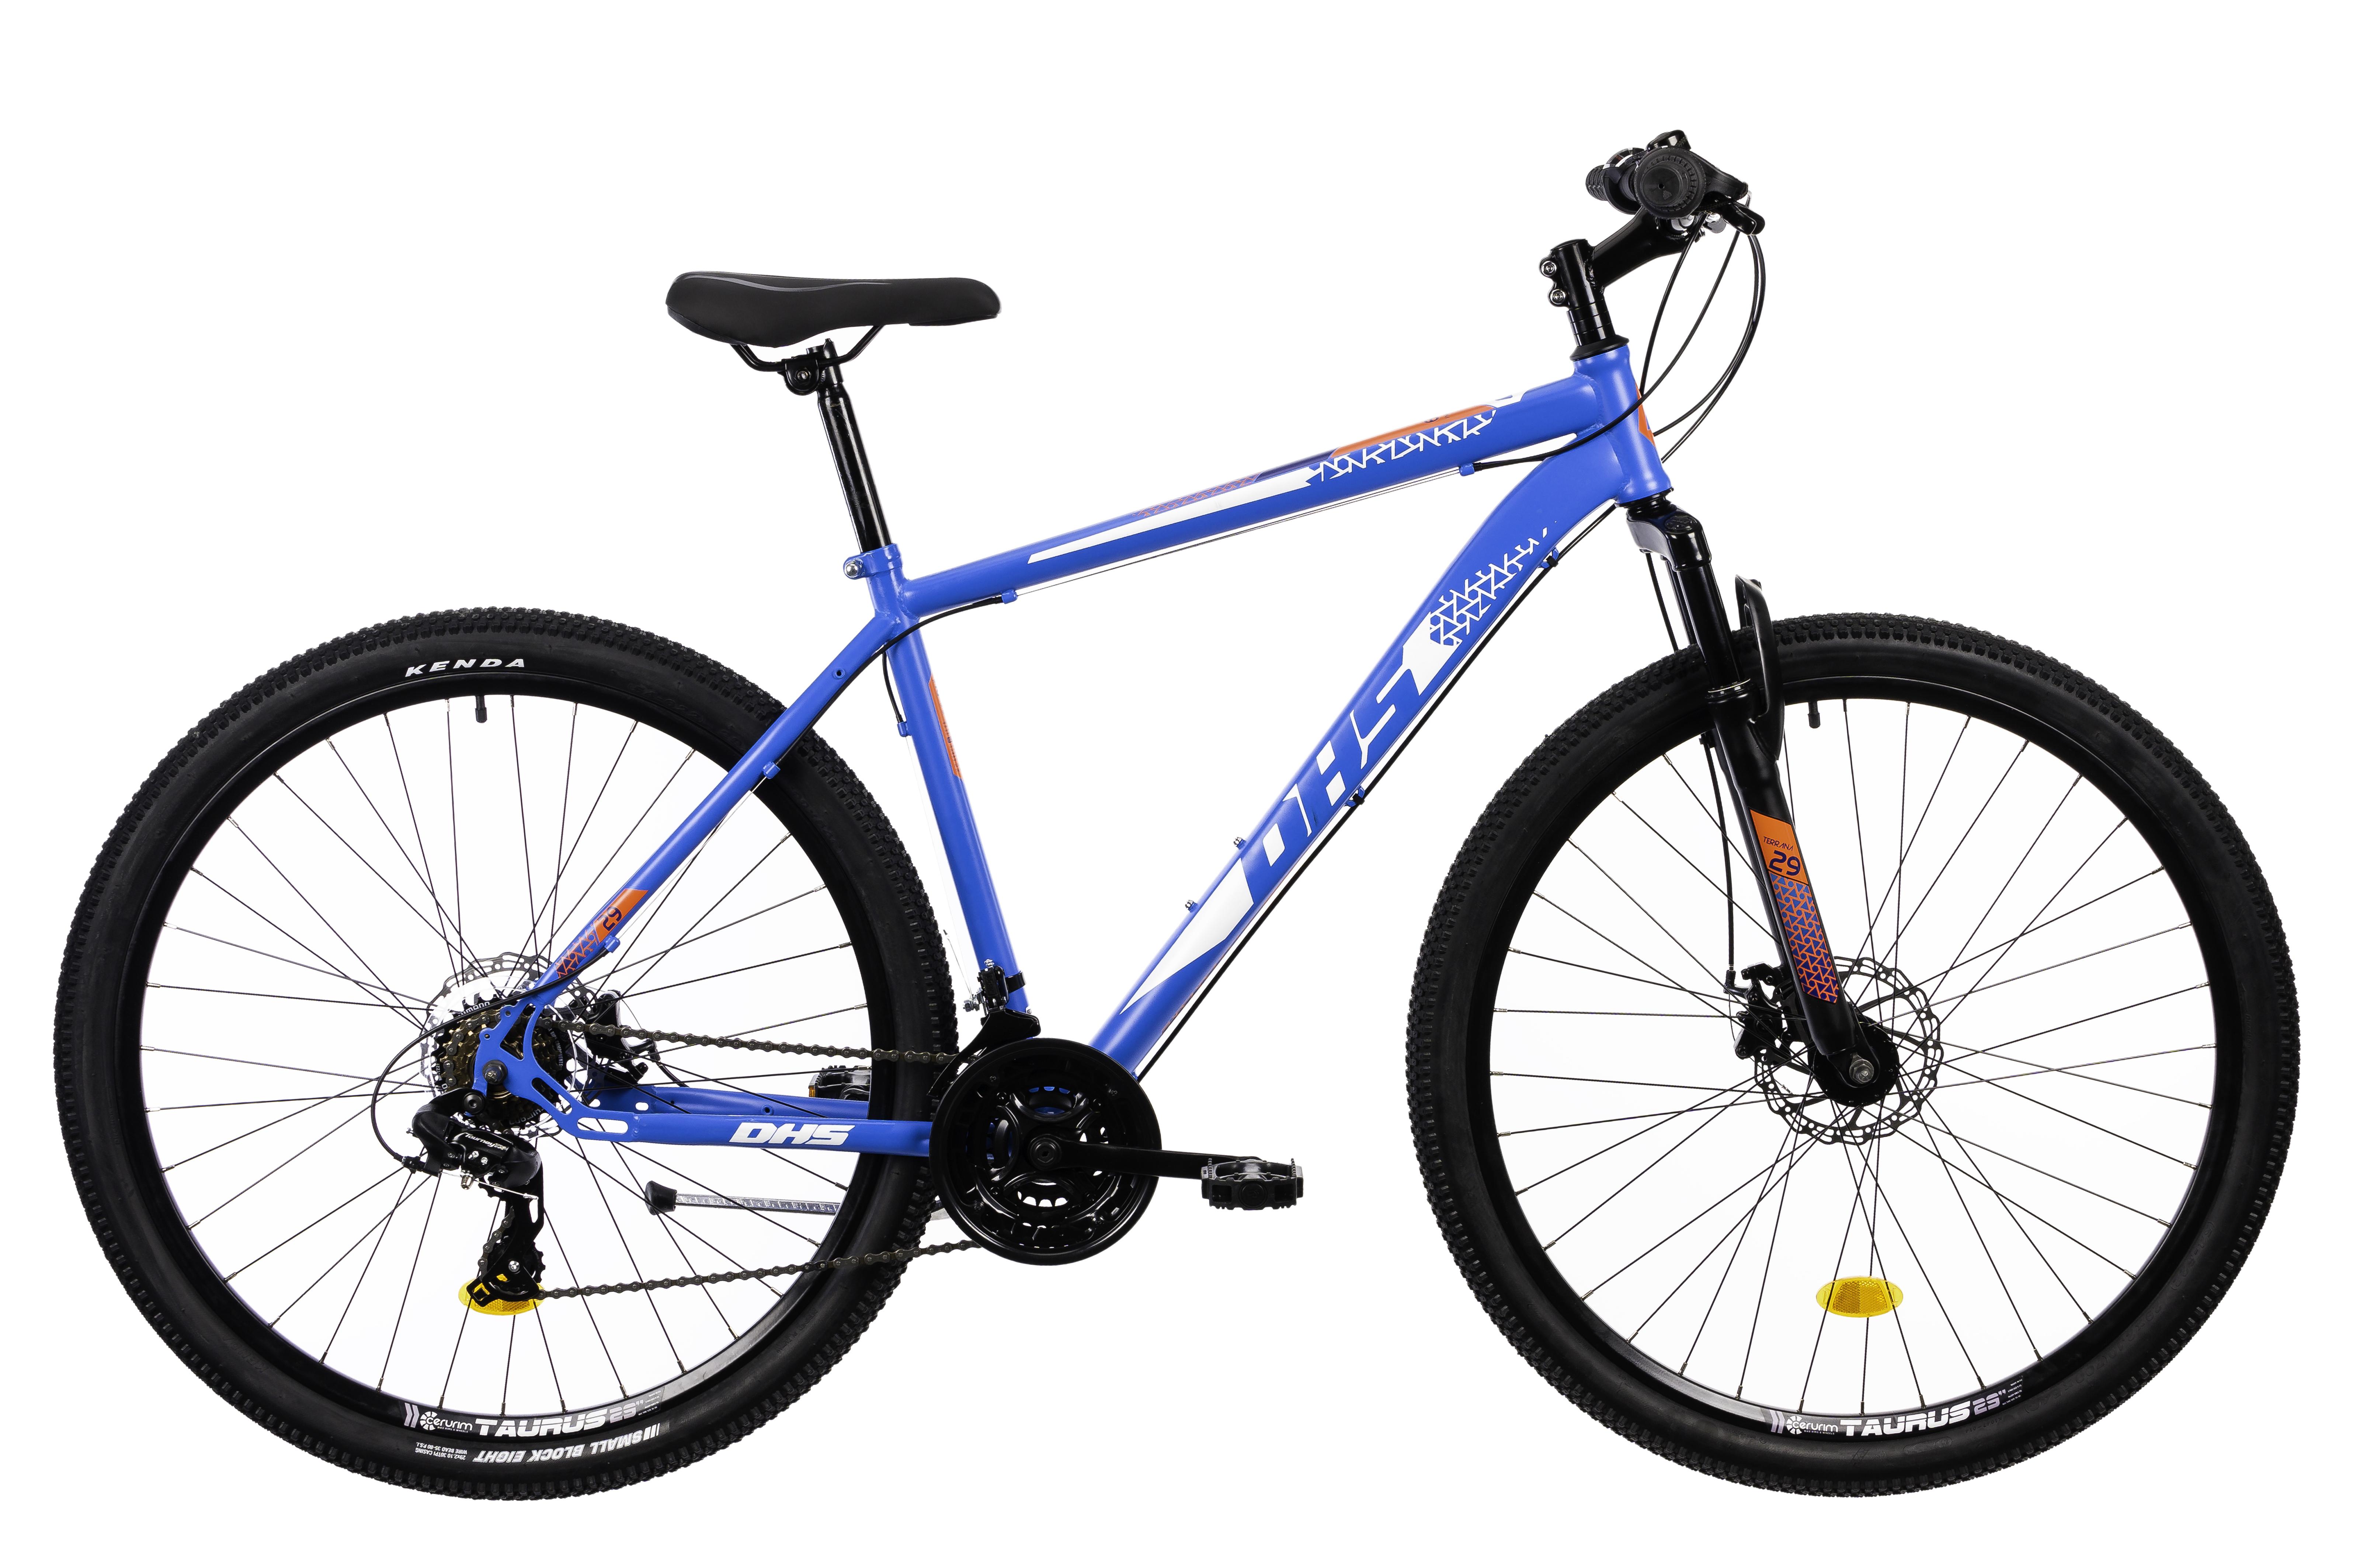 Bicicleta Mtb Terrana 2905 - 29 Inch, M, Gri [19]